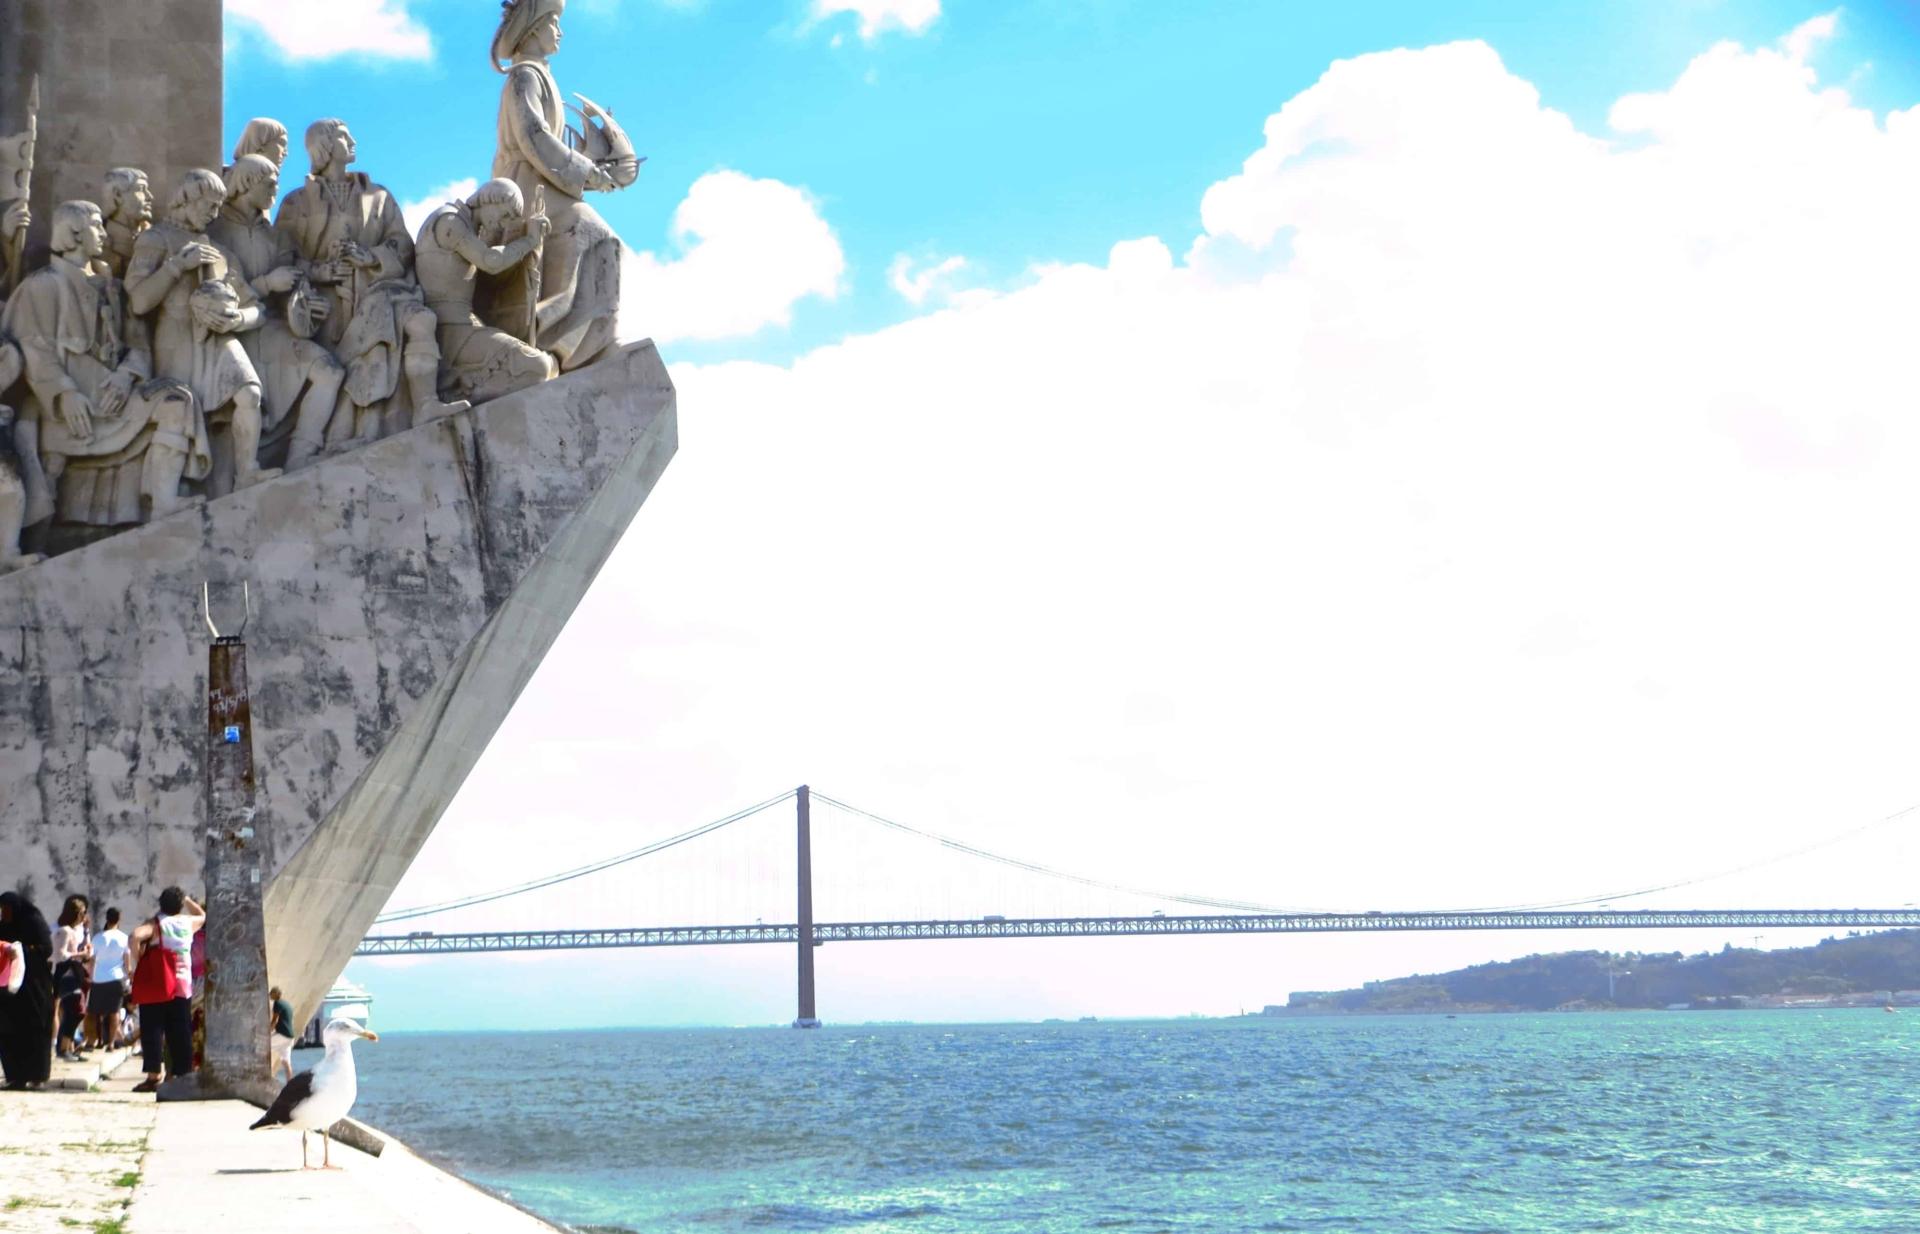 00 Padrao dos Descobrimentos Denkmal der Entdeckungen und Hangebruecke Belem Citytrip Lissabon Portugal e1414514579673